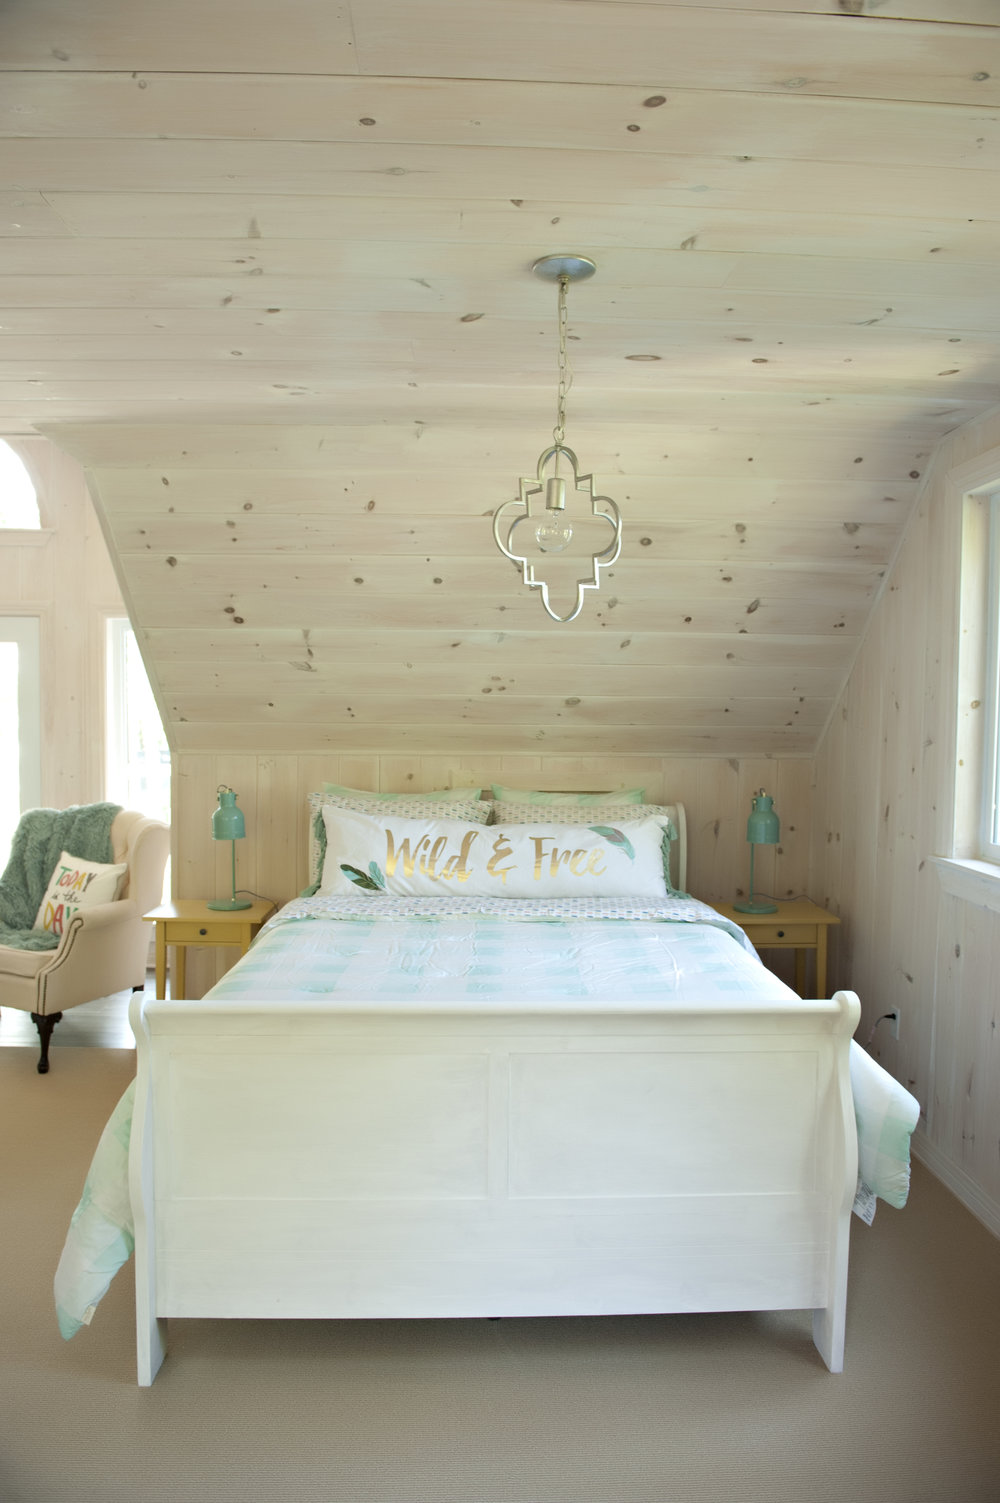 Candace-Plotz-Design-Beach-House-1-Sleigh-Bed